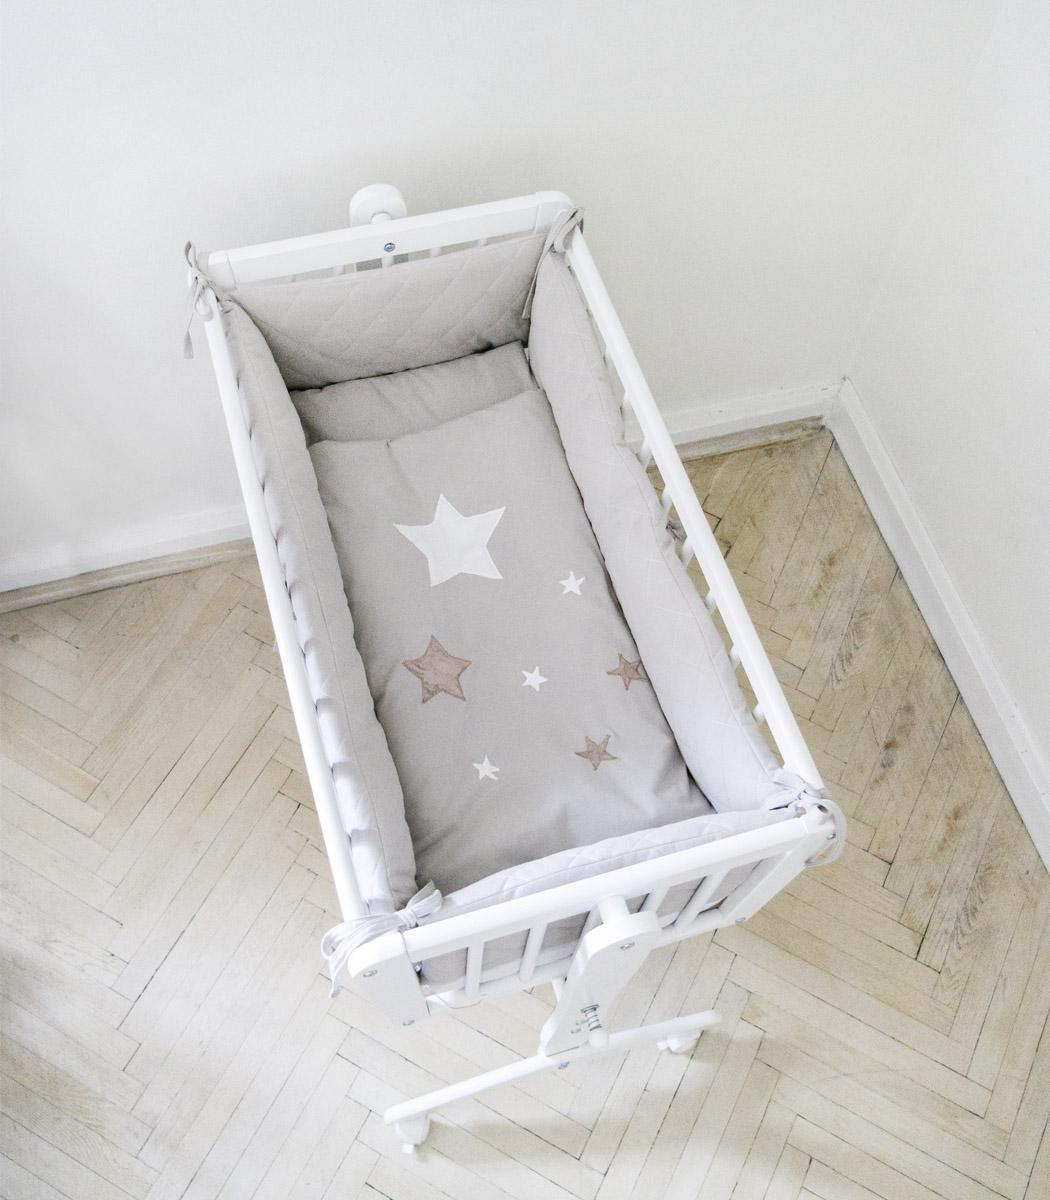 gwiazda po ciel do w zka ko yski. Black Bedroom Furniture Sets. Home Design Ideas